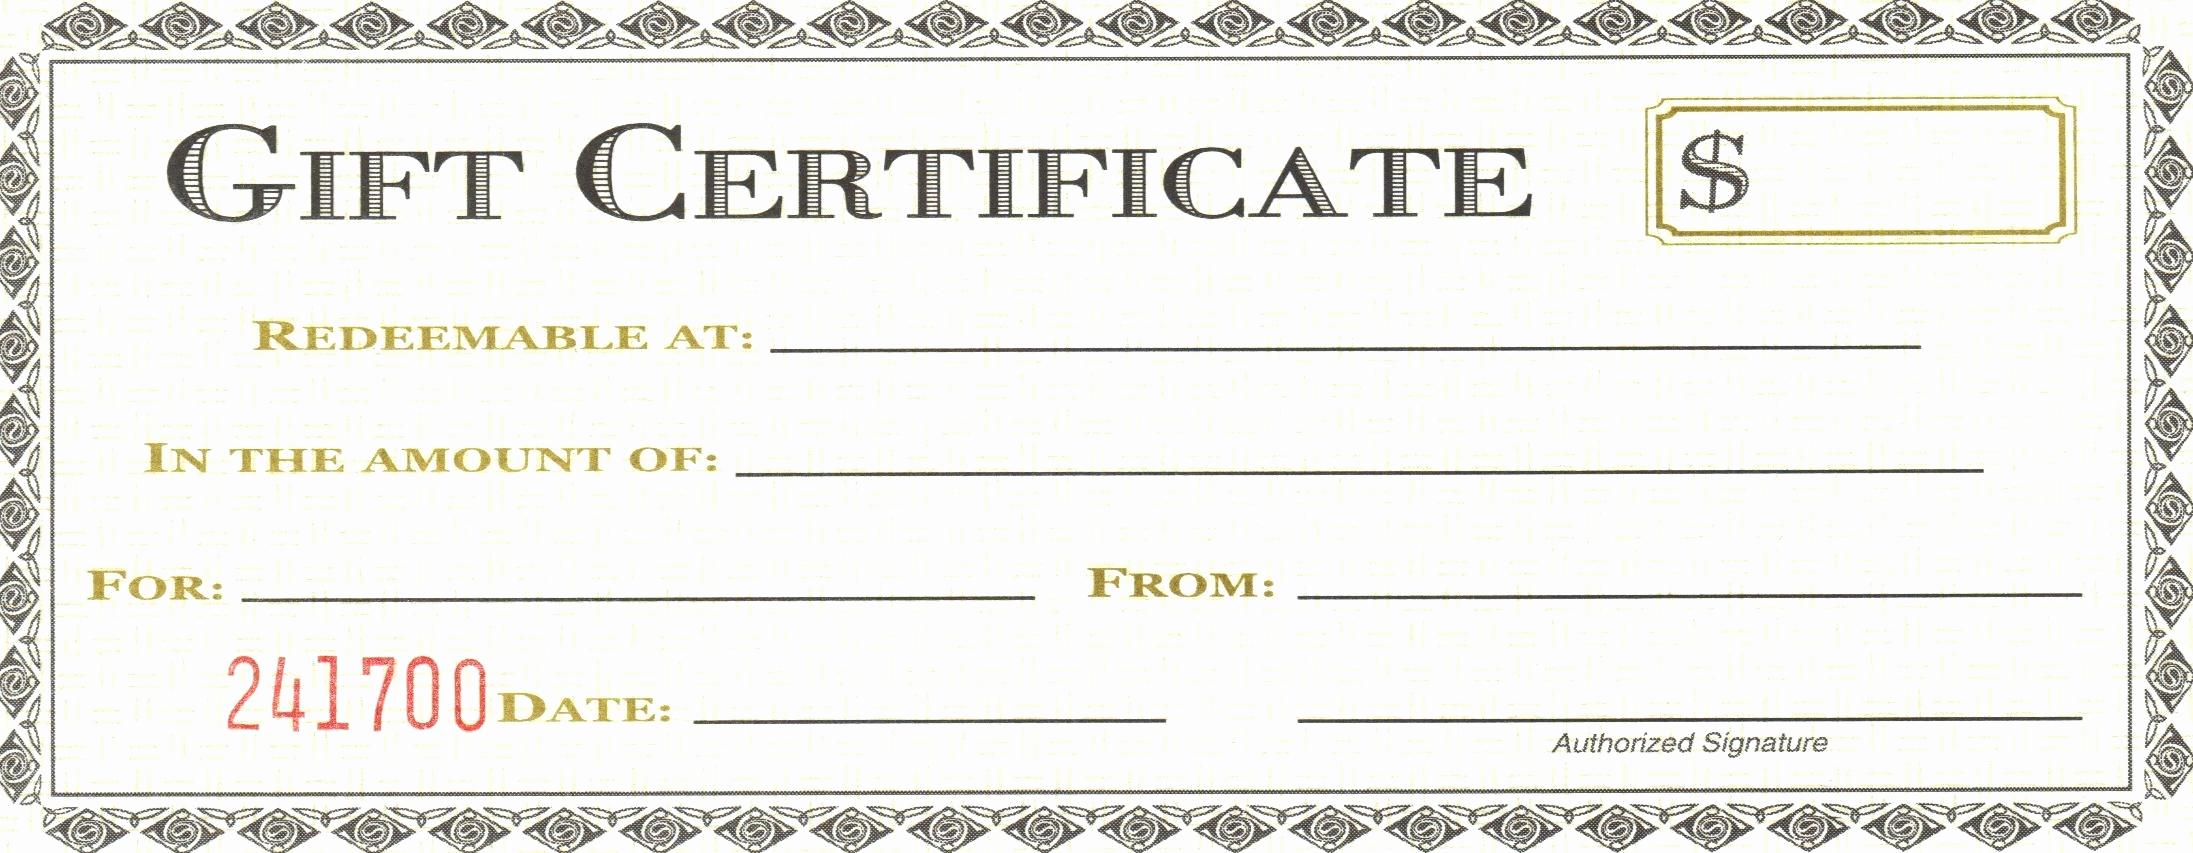 Google Docs Gift Certificate Template Elegant Gift Certificate Google Doc Template